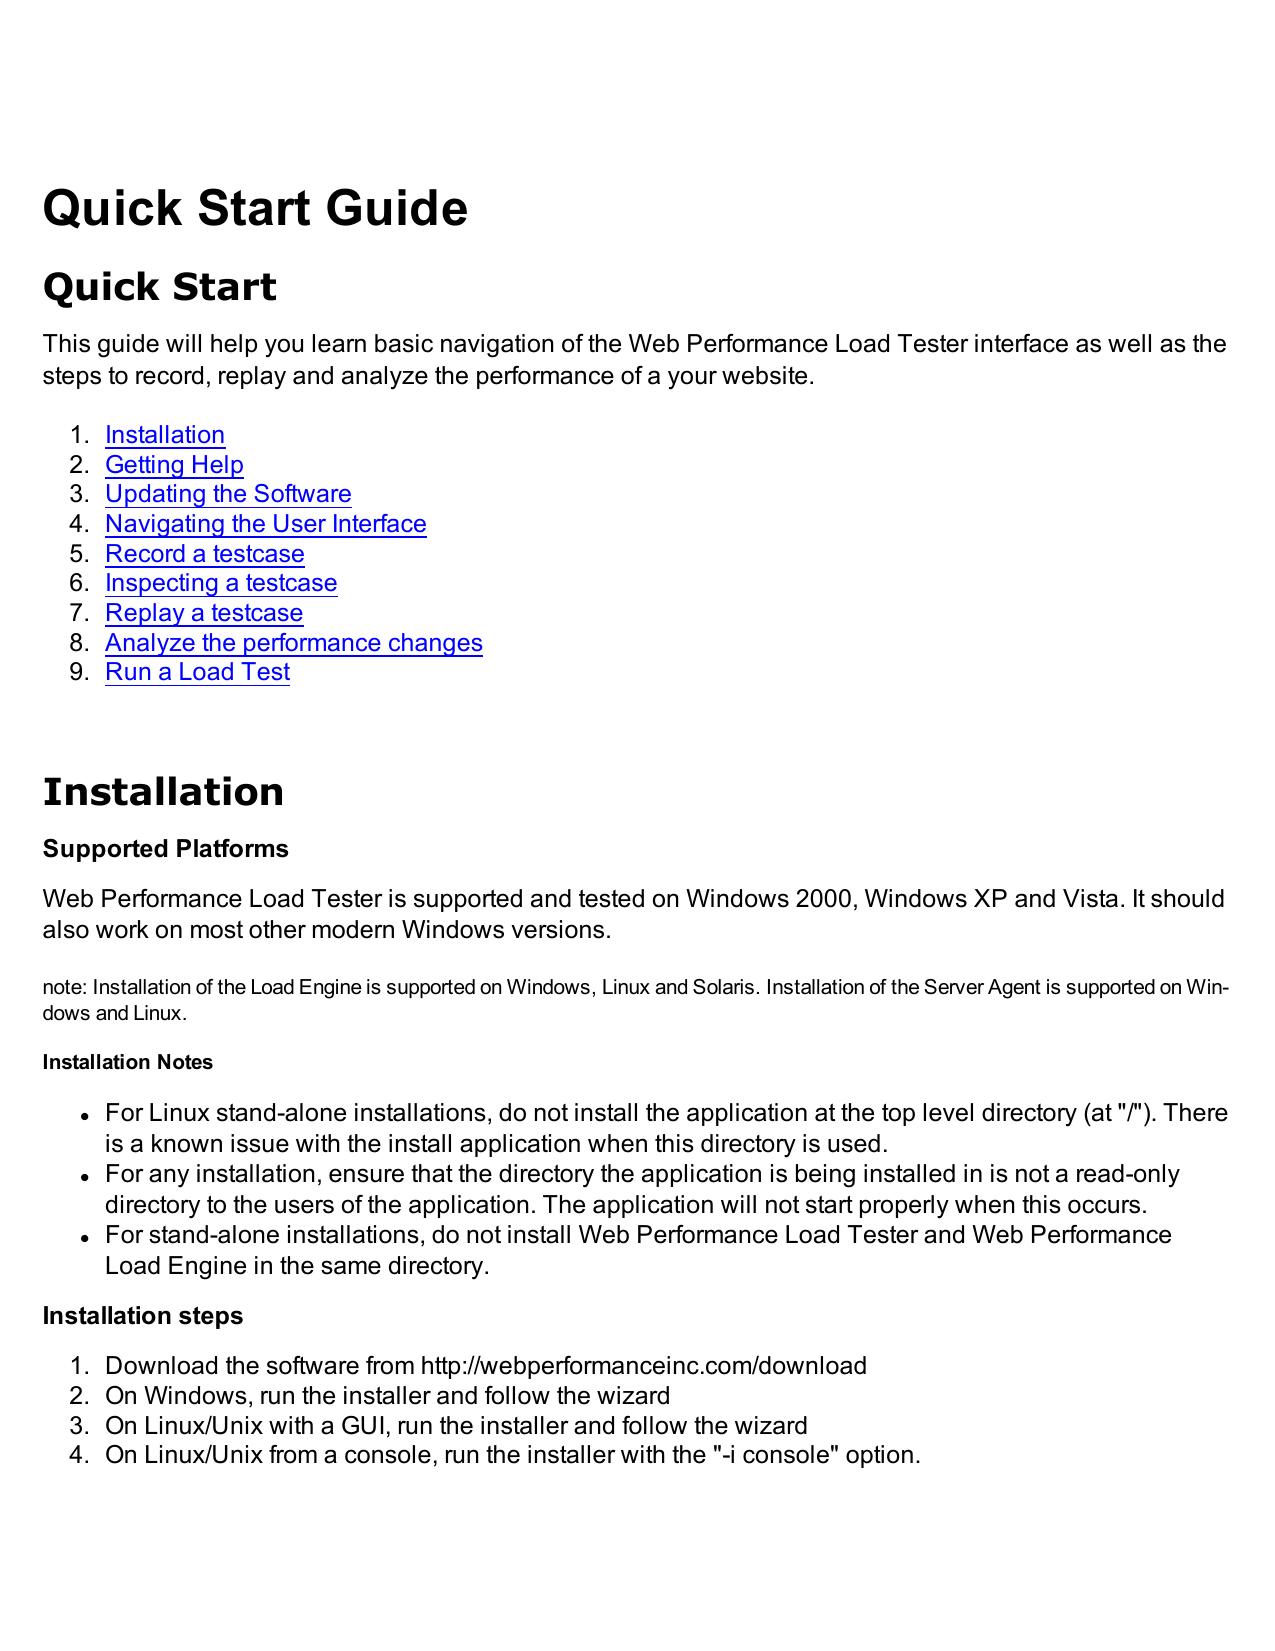 Web Performance Load Tester 3 6 manual | manualzz com